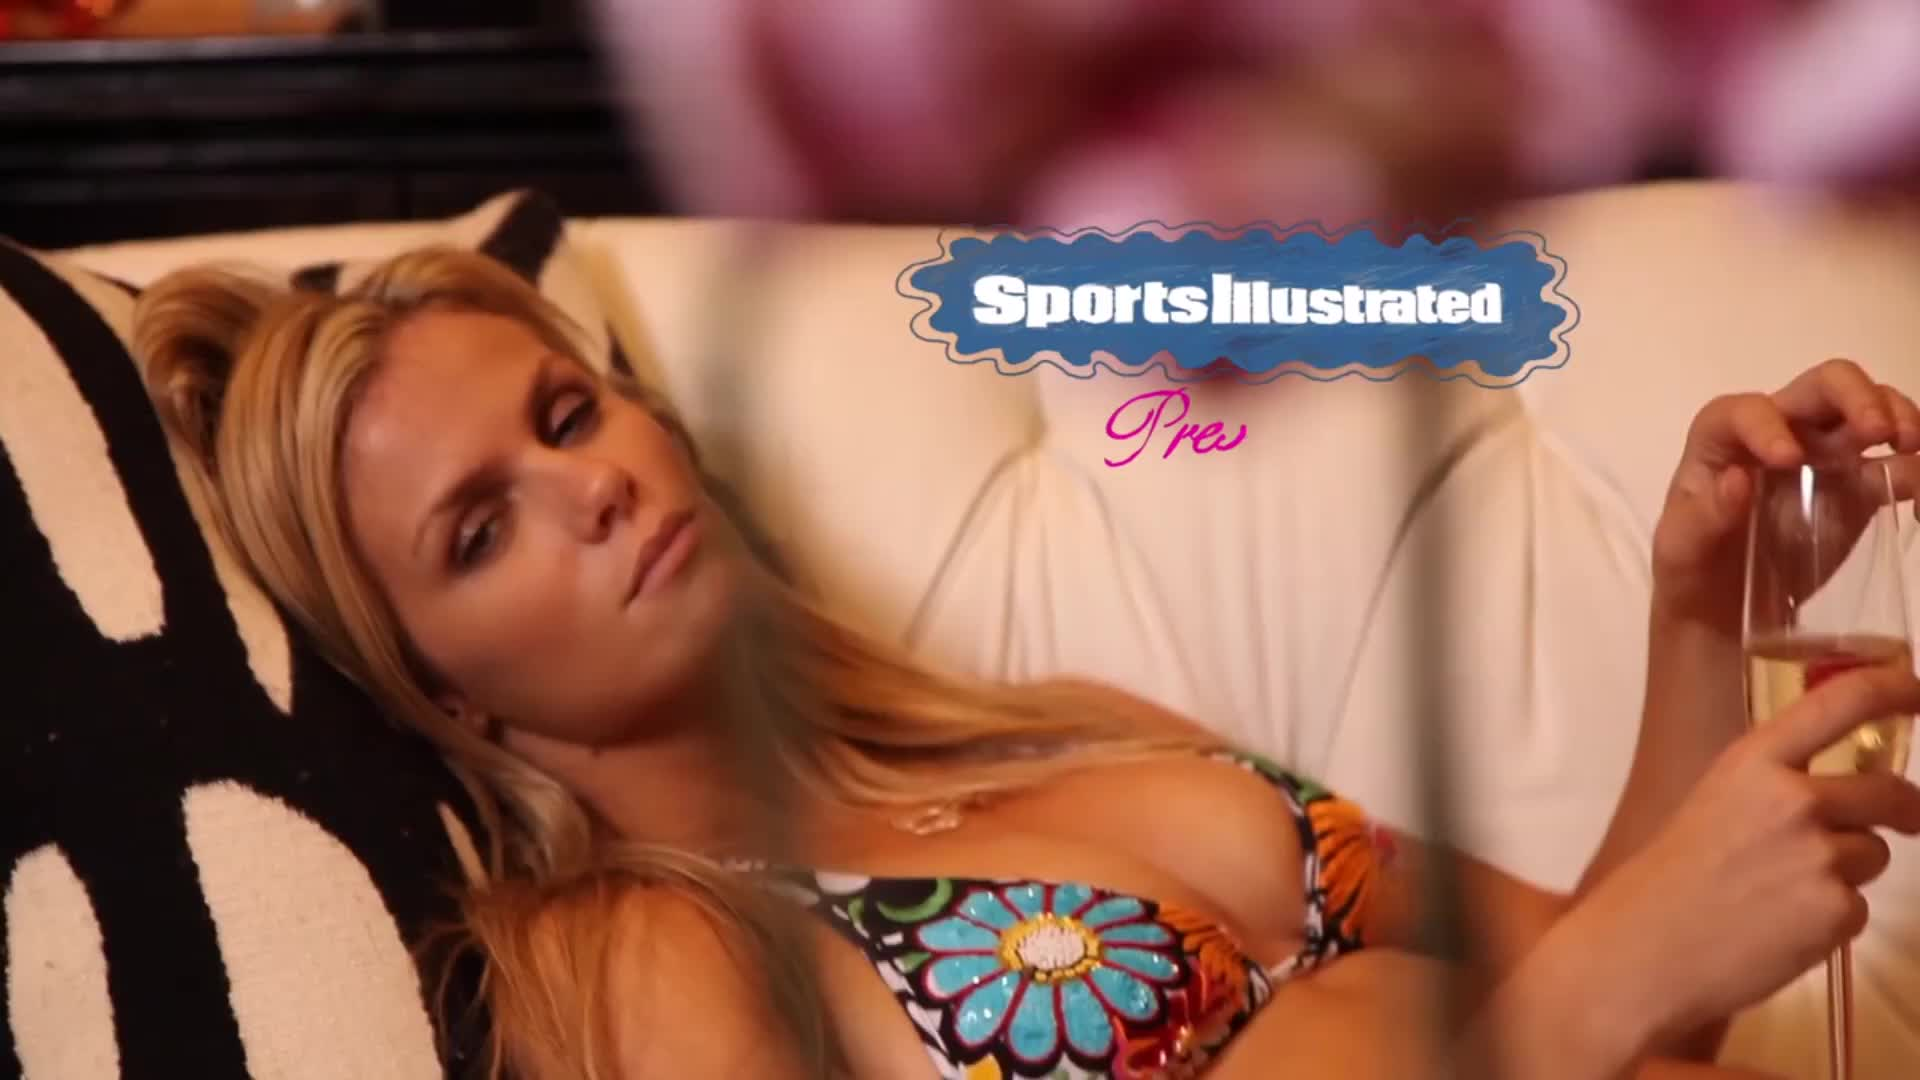 2011model, brooklyn decker, brooklyn decker si swimsuit, brooklyn decker thirsty, brooklyn decker2011, brooklyn deckerbikini, brooklyn deckerphotoshoot, brooklyndecker, sunsetbikini, sunsetphotoshoot, sunsetvideo, Brooklyn Decker Takes A Sip On Heaven Against The Sunset | Intimates | Sports Illustrated Swimsuit GIFs